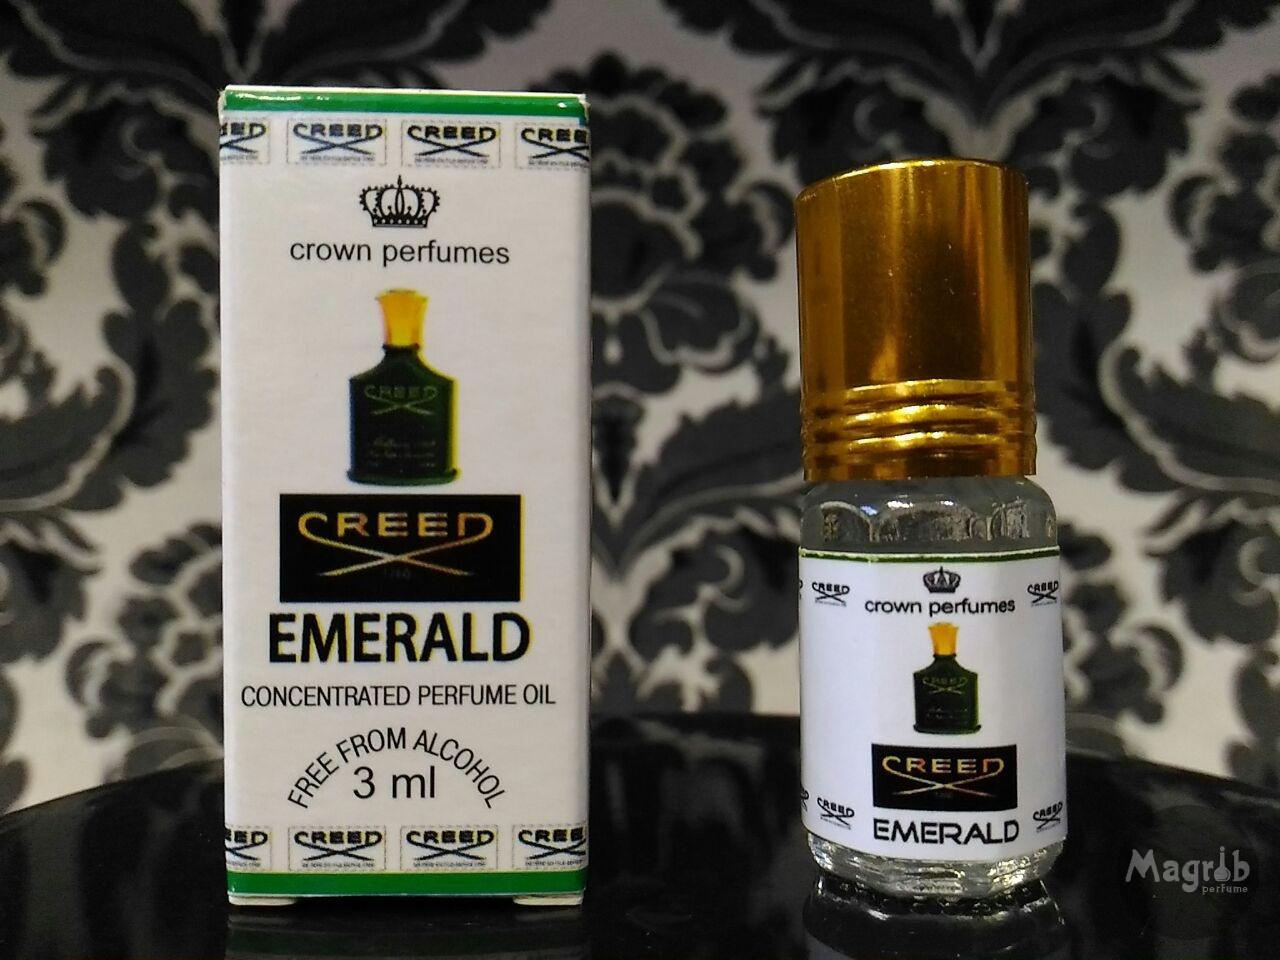 Ravza Creed Emerald - унисекс, масляные духи